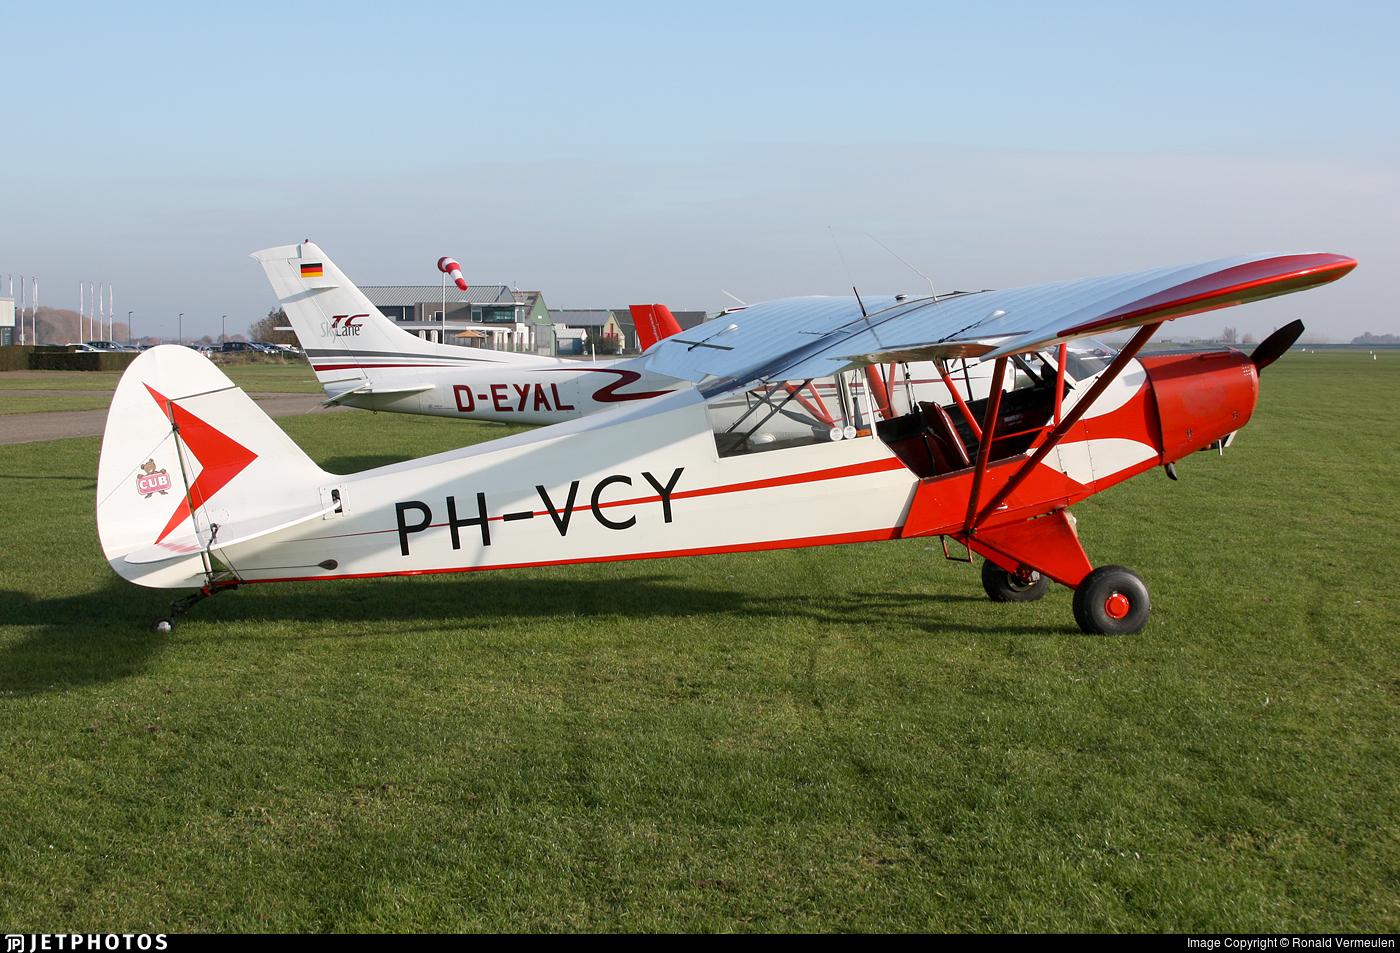 PH-VCY - Piper PA-18-95 Super Cub - Vliegclub Hoevenen